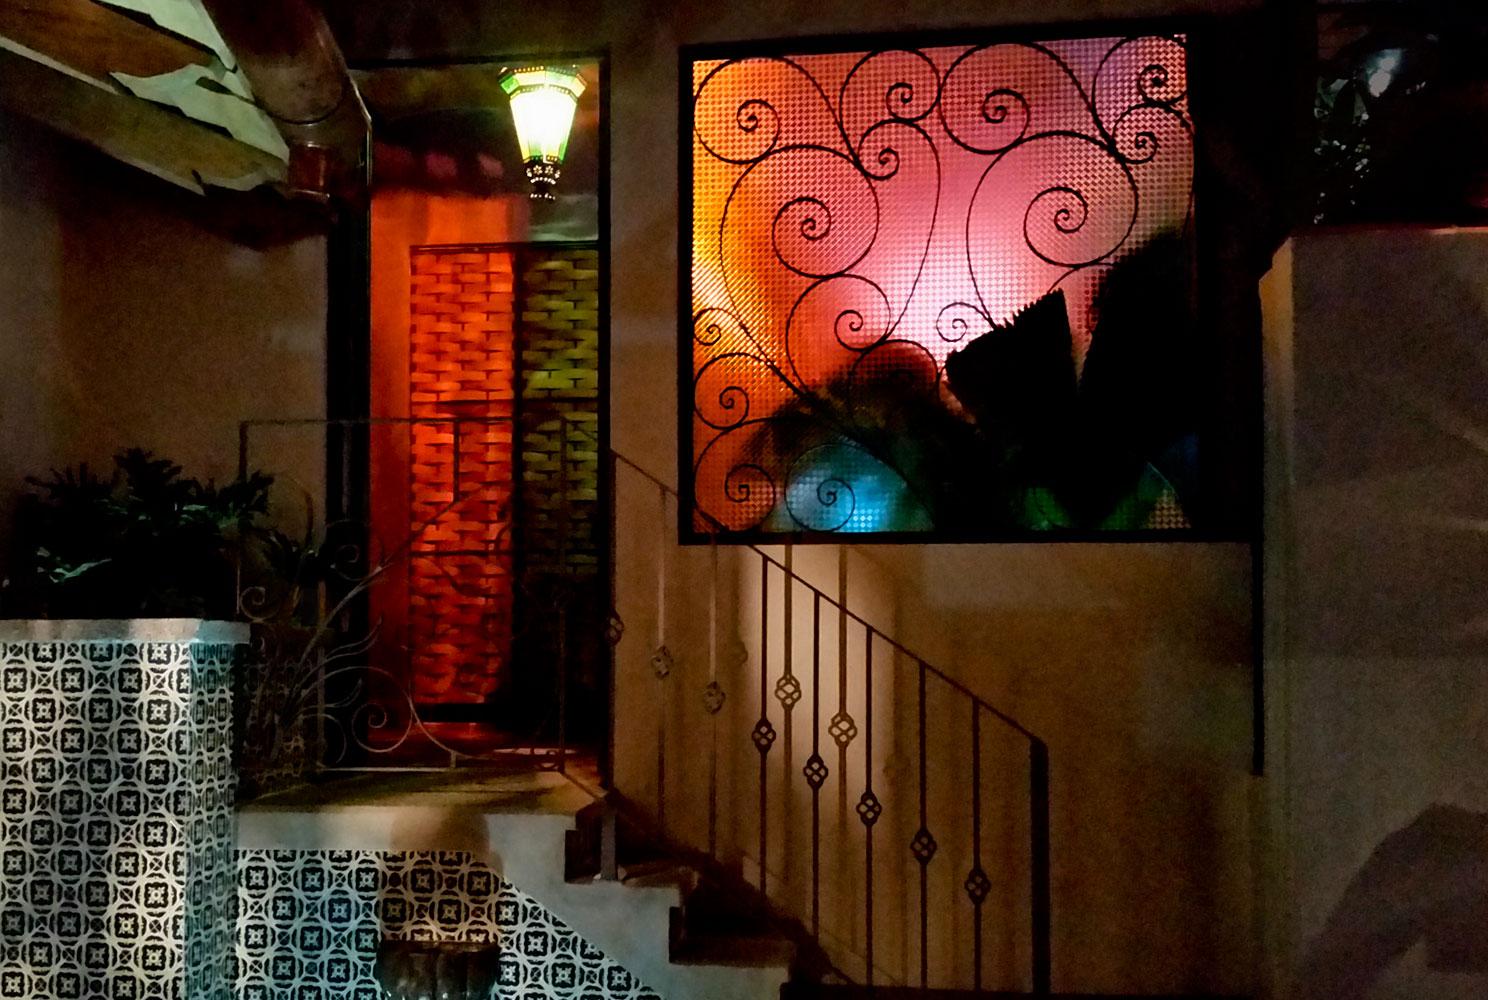 Casa-Joyero-Sayulita-15-entrance-01-47.jpg